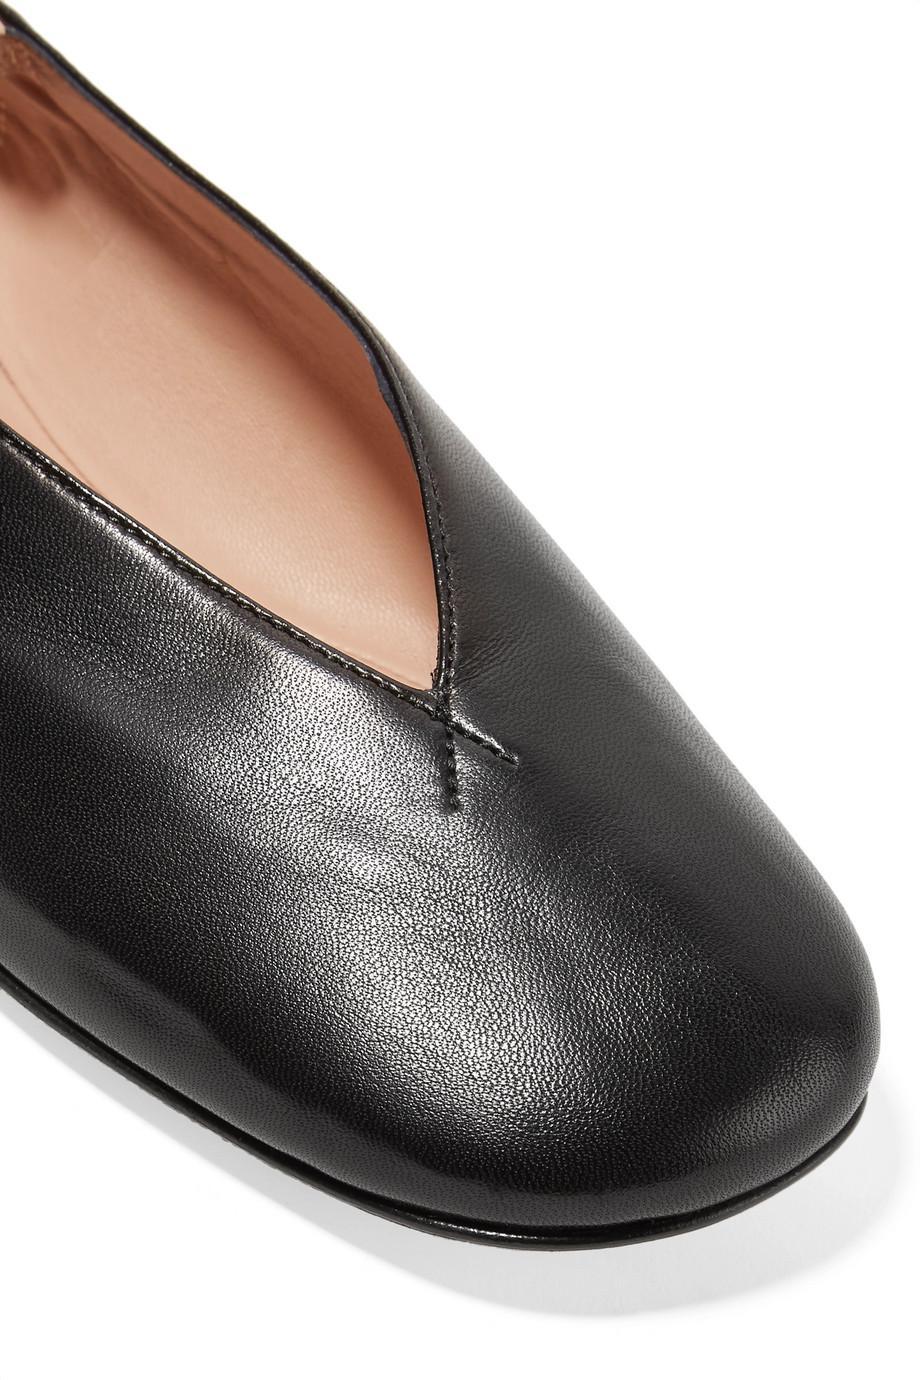 Odry Leather Ballet Flats - Black Acne Studios ZM4zWs61